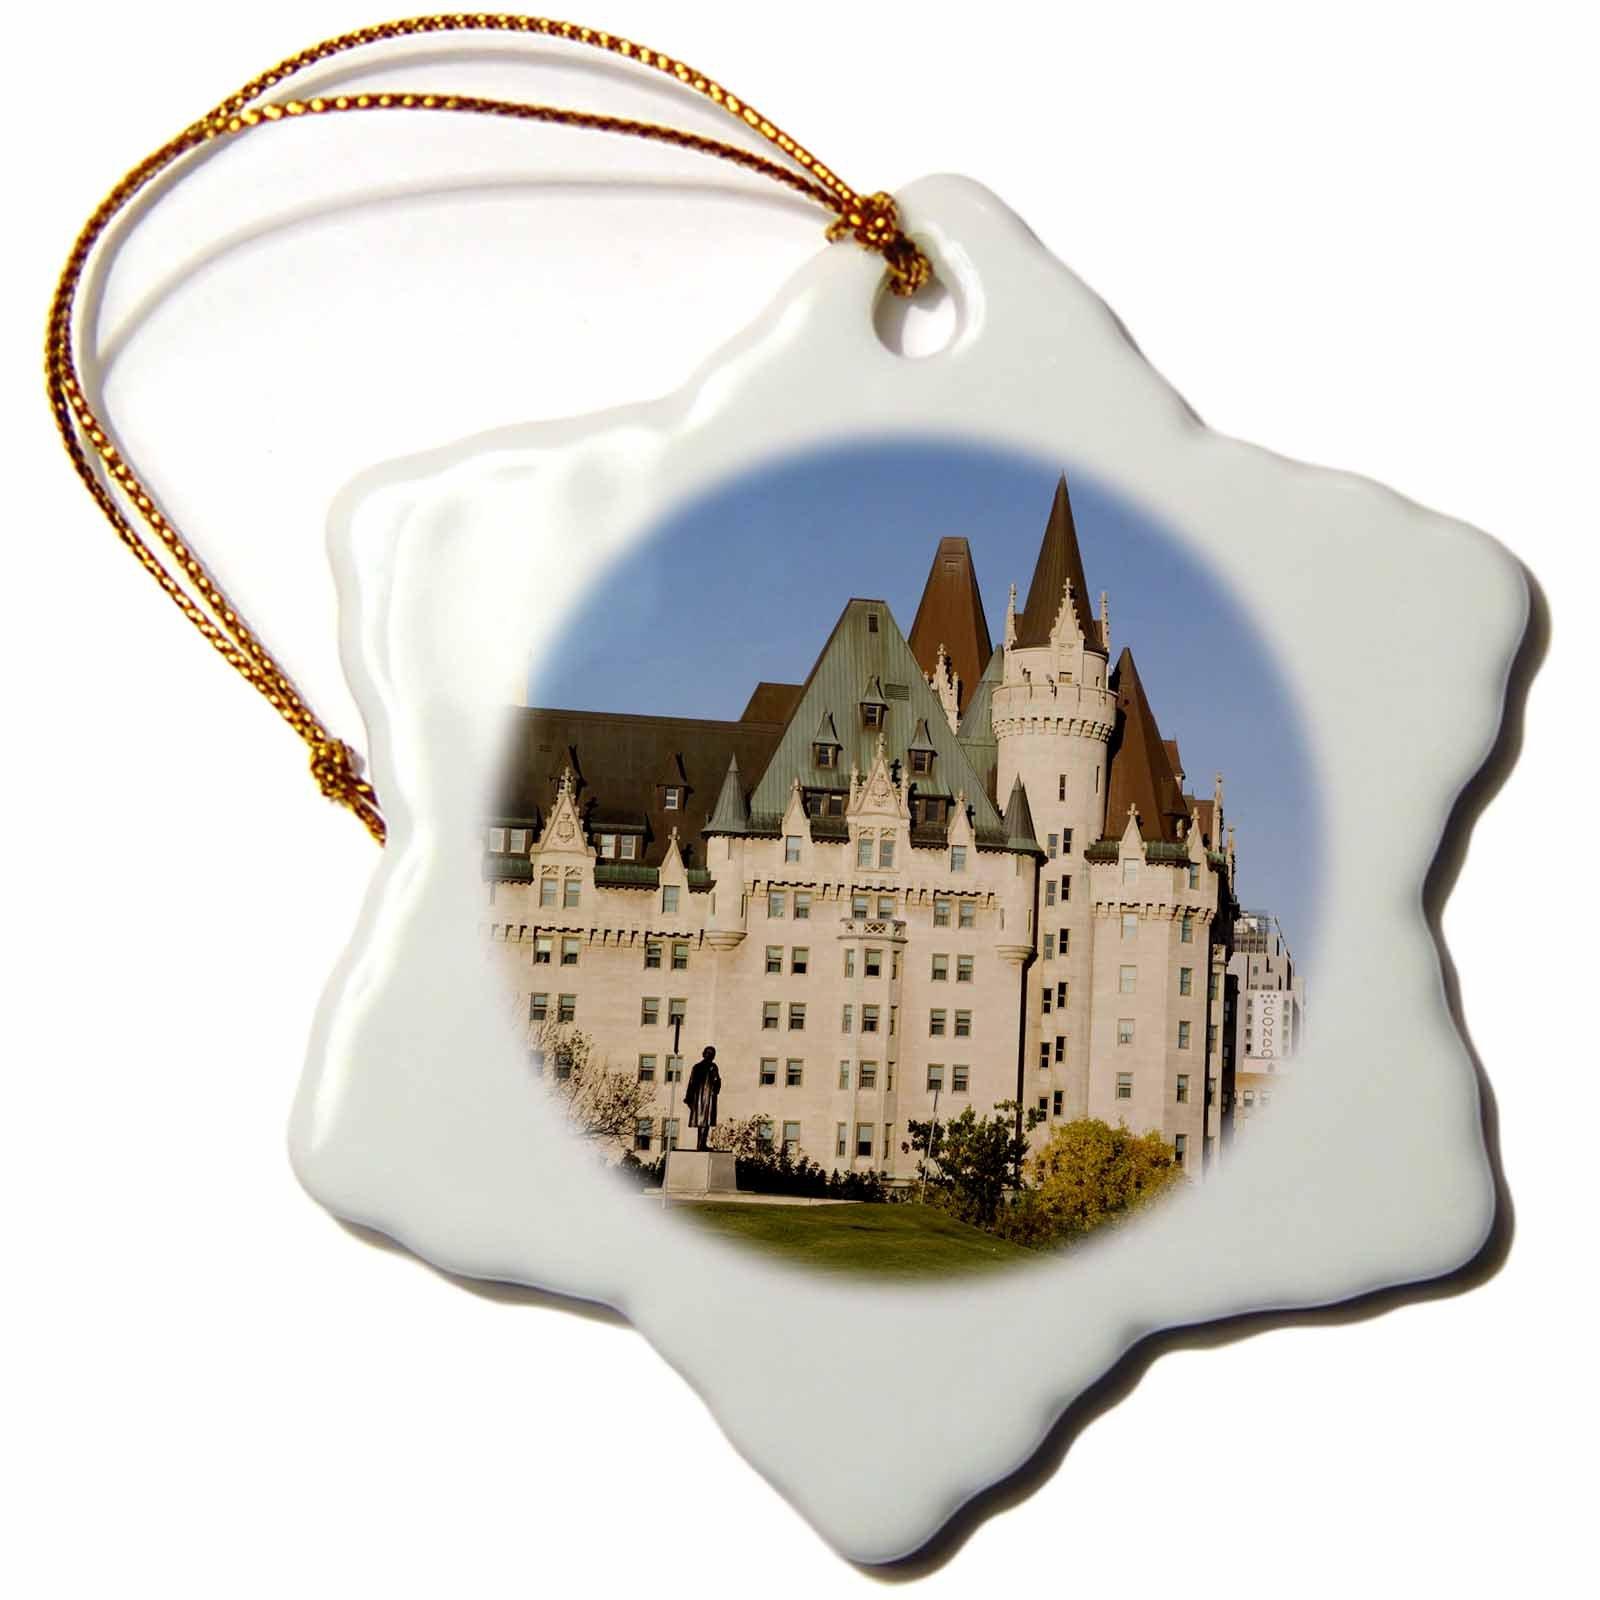 3dRose orn_74029_1 Chateau Laurier Hotel in Ottawa, Ontario, Canada-CN08 KPI0002-Kristin Piljay-Snowflake Ornament, Porcelain, 3-Inch